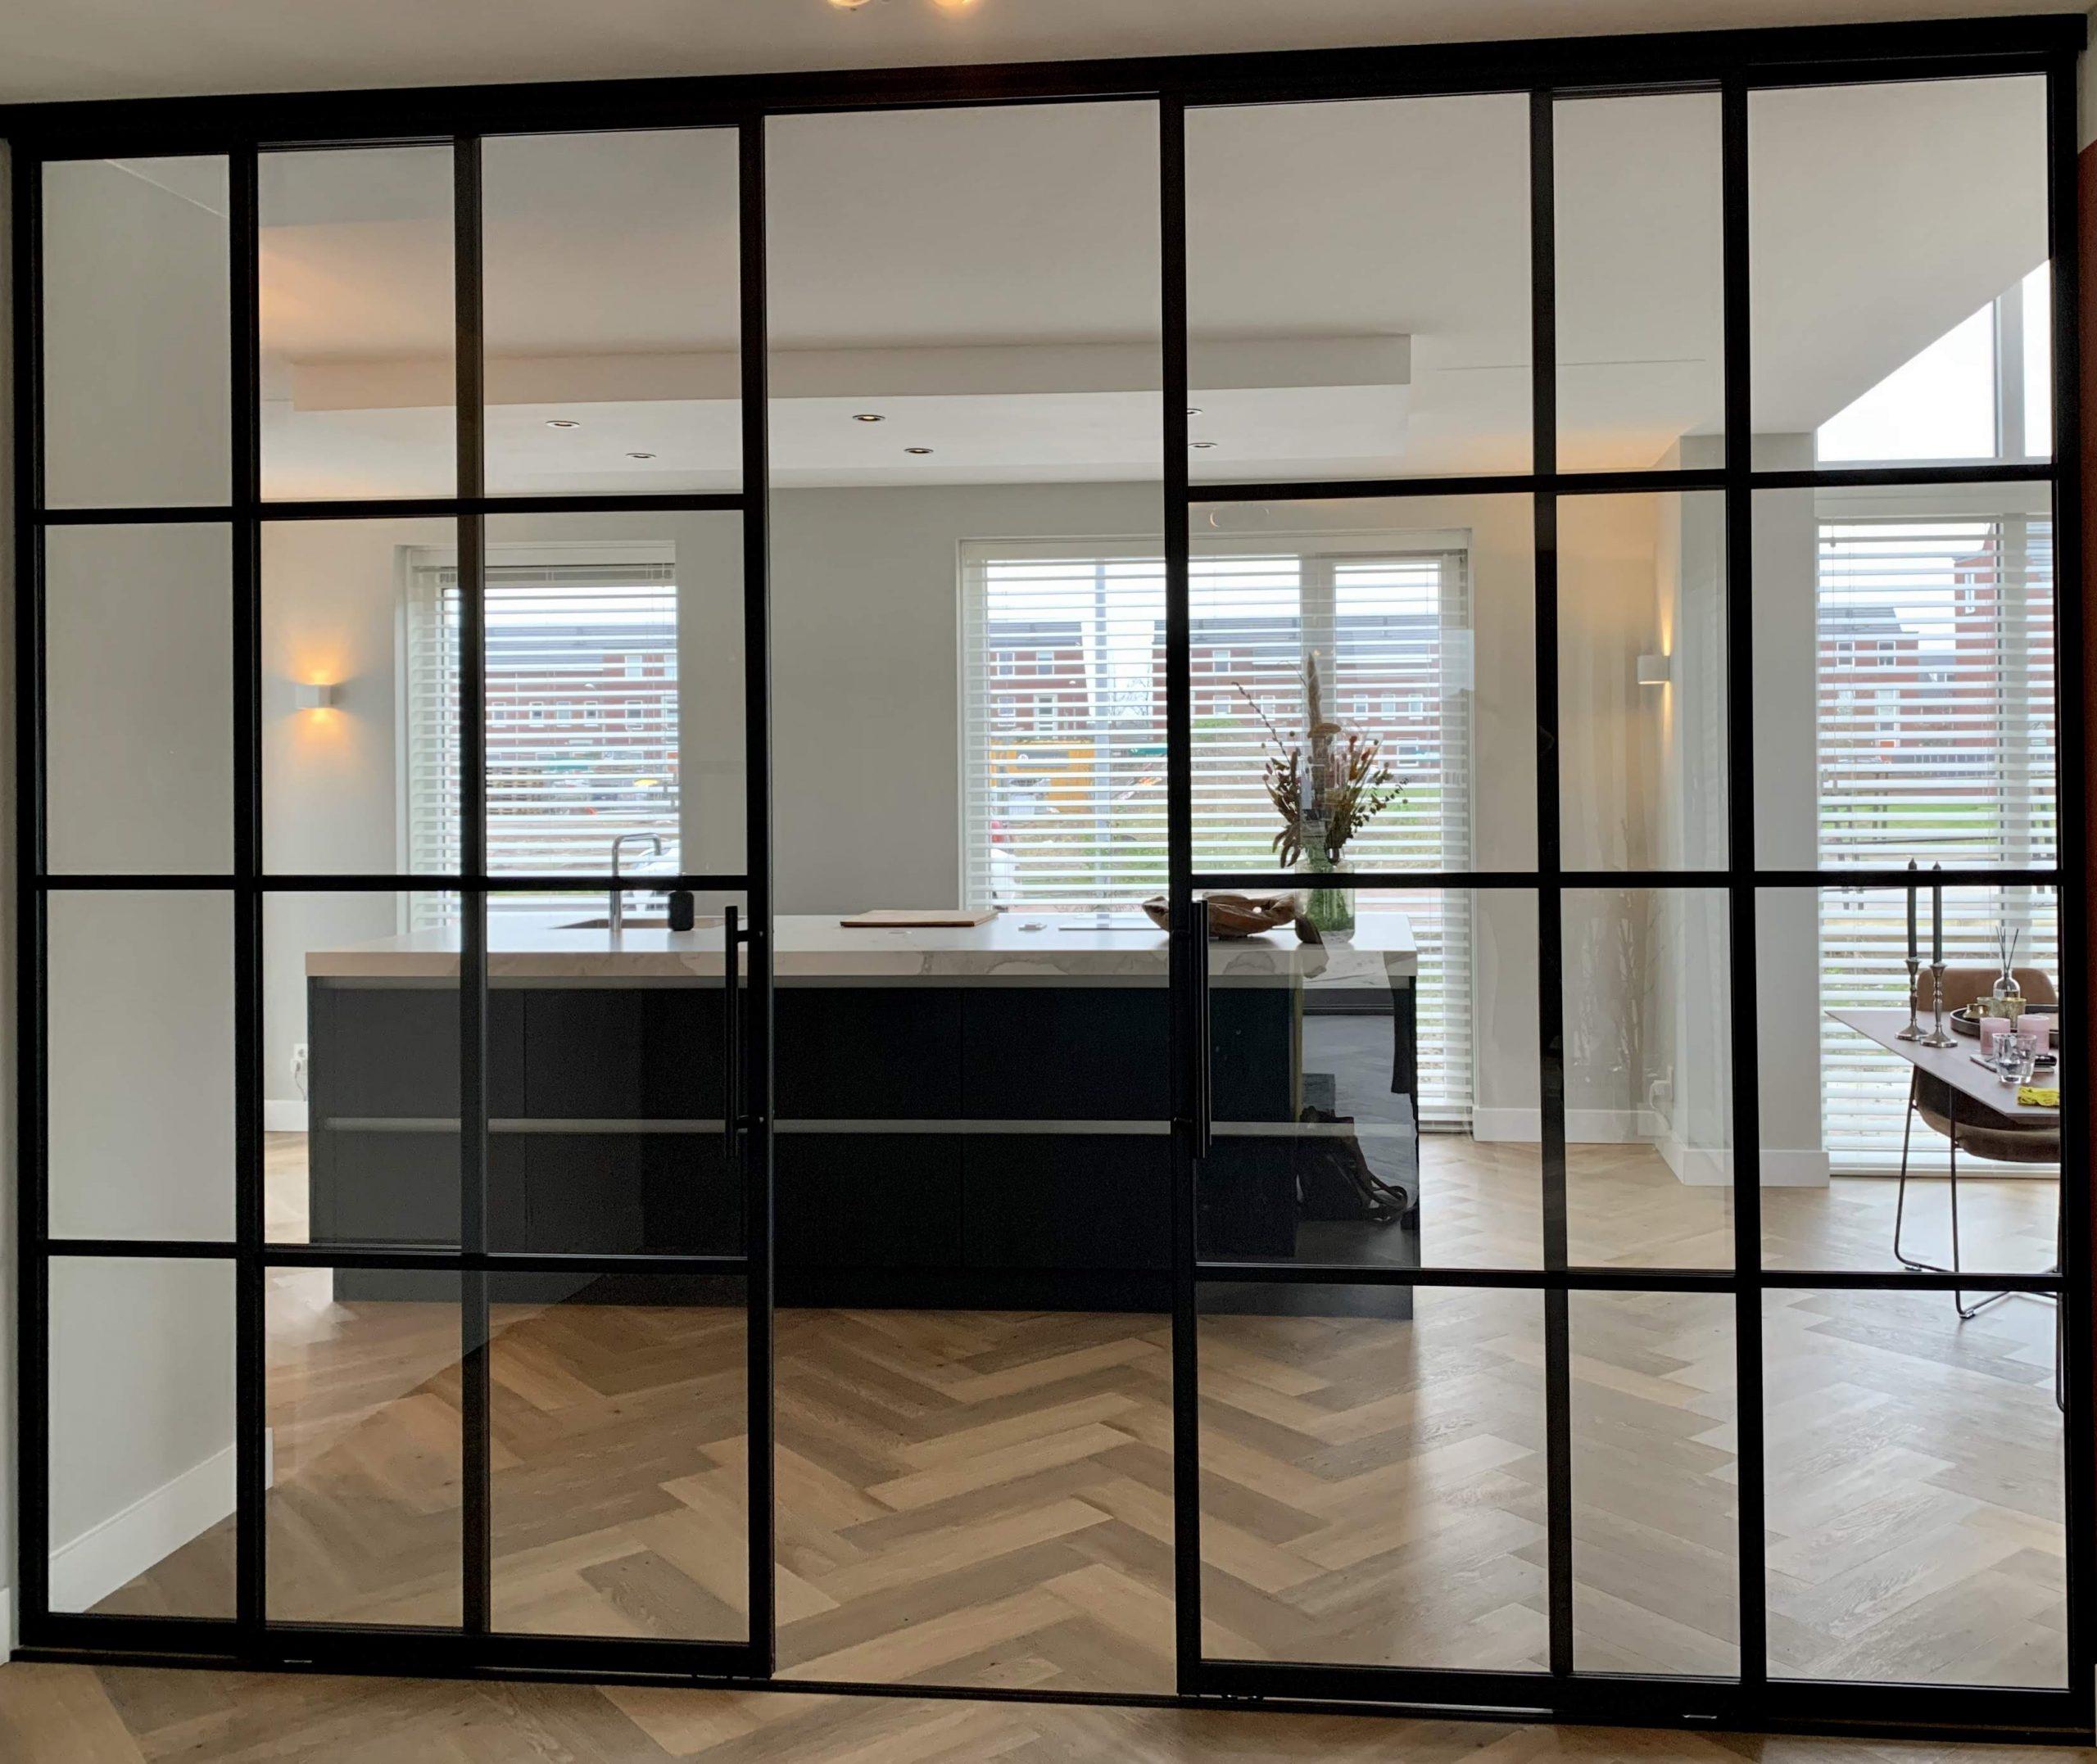 Interieuradvies Zwolle -Interieuradvies - interieur - stylingadvies - Zwolle - inrichting - interieurstyling